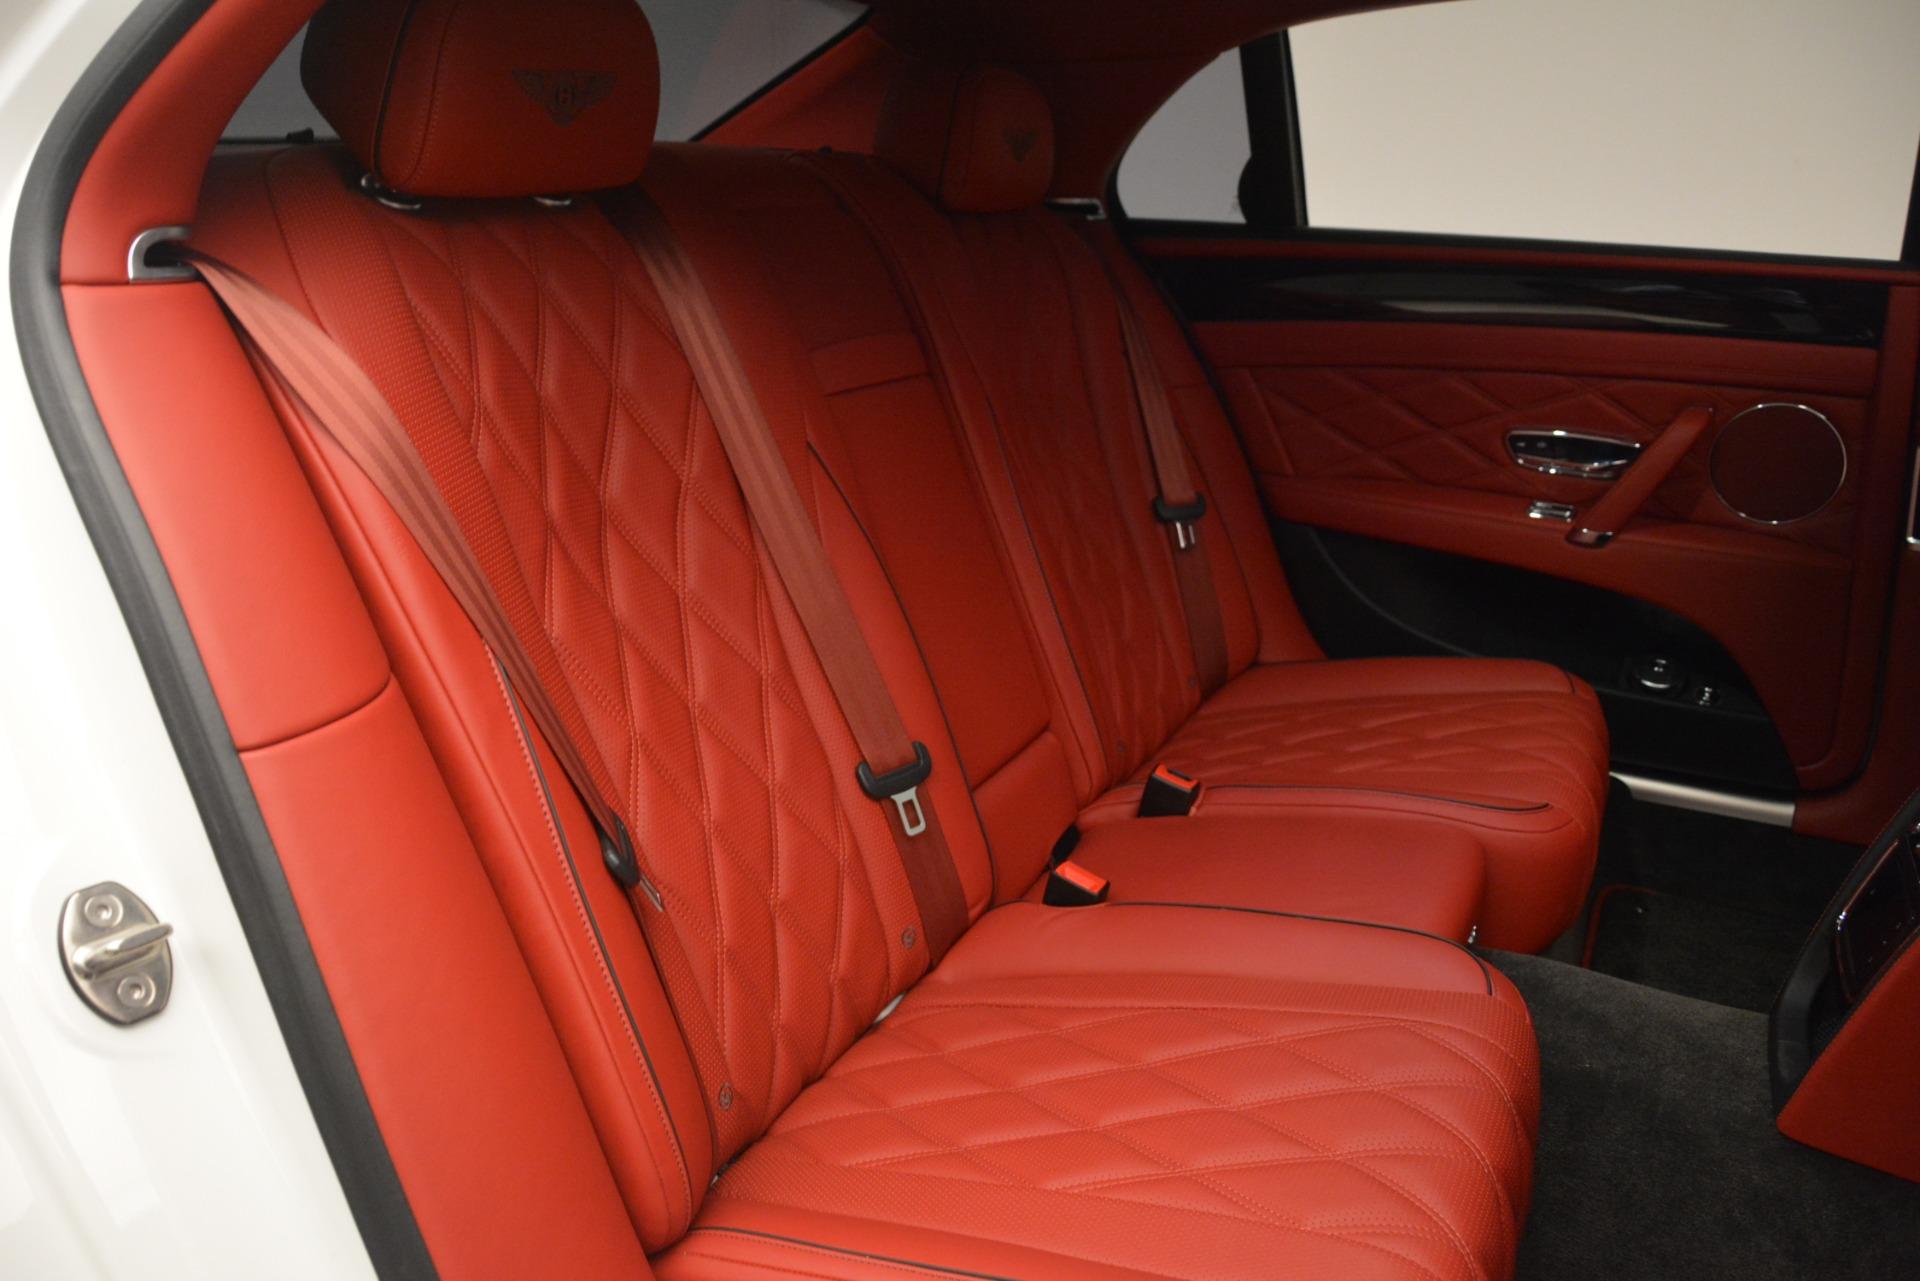 Used 2016 Bentley Flying Spur V8 For Sale In Westport, CT 3265_p27